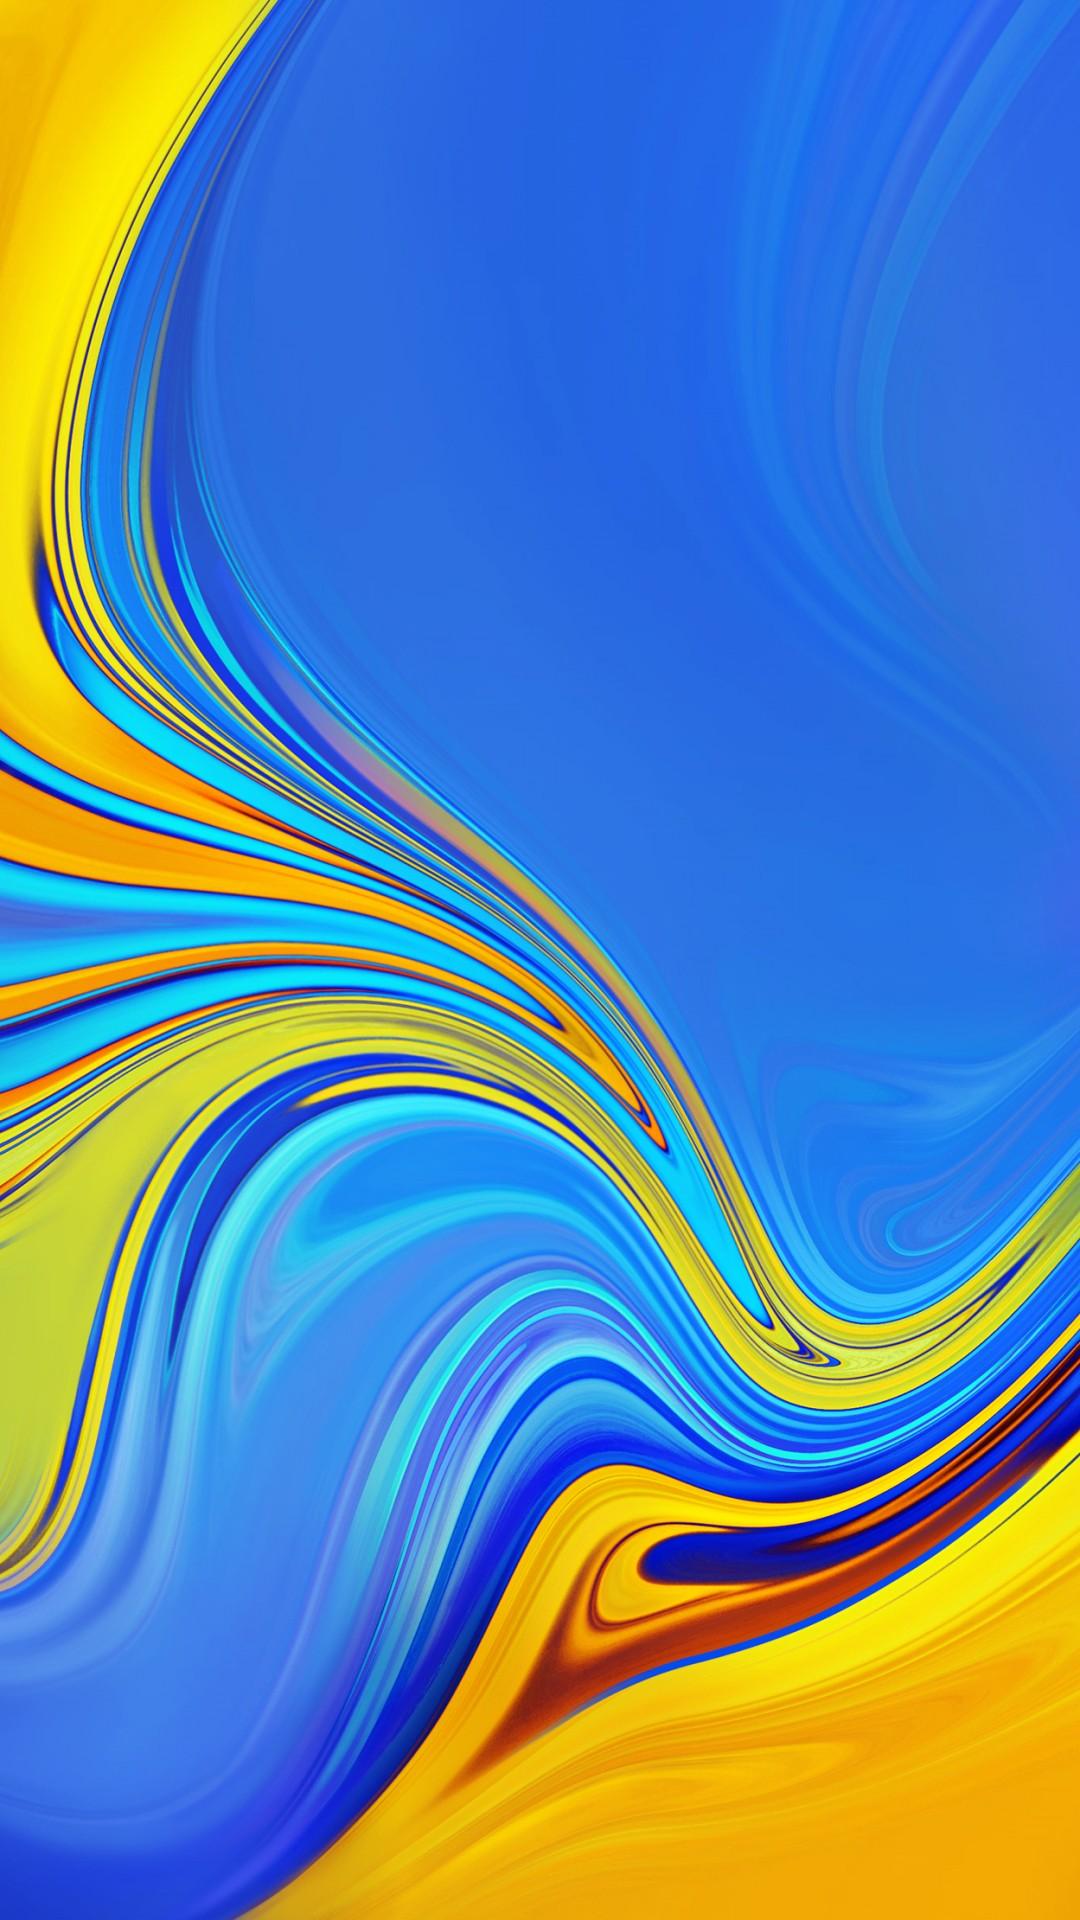 Wallpaper Samsung Galaxy A9 Samsung Galaxy A7 Android 80 1080x1920